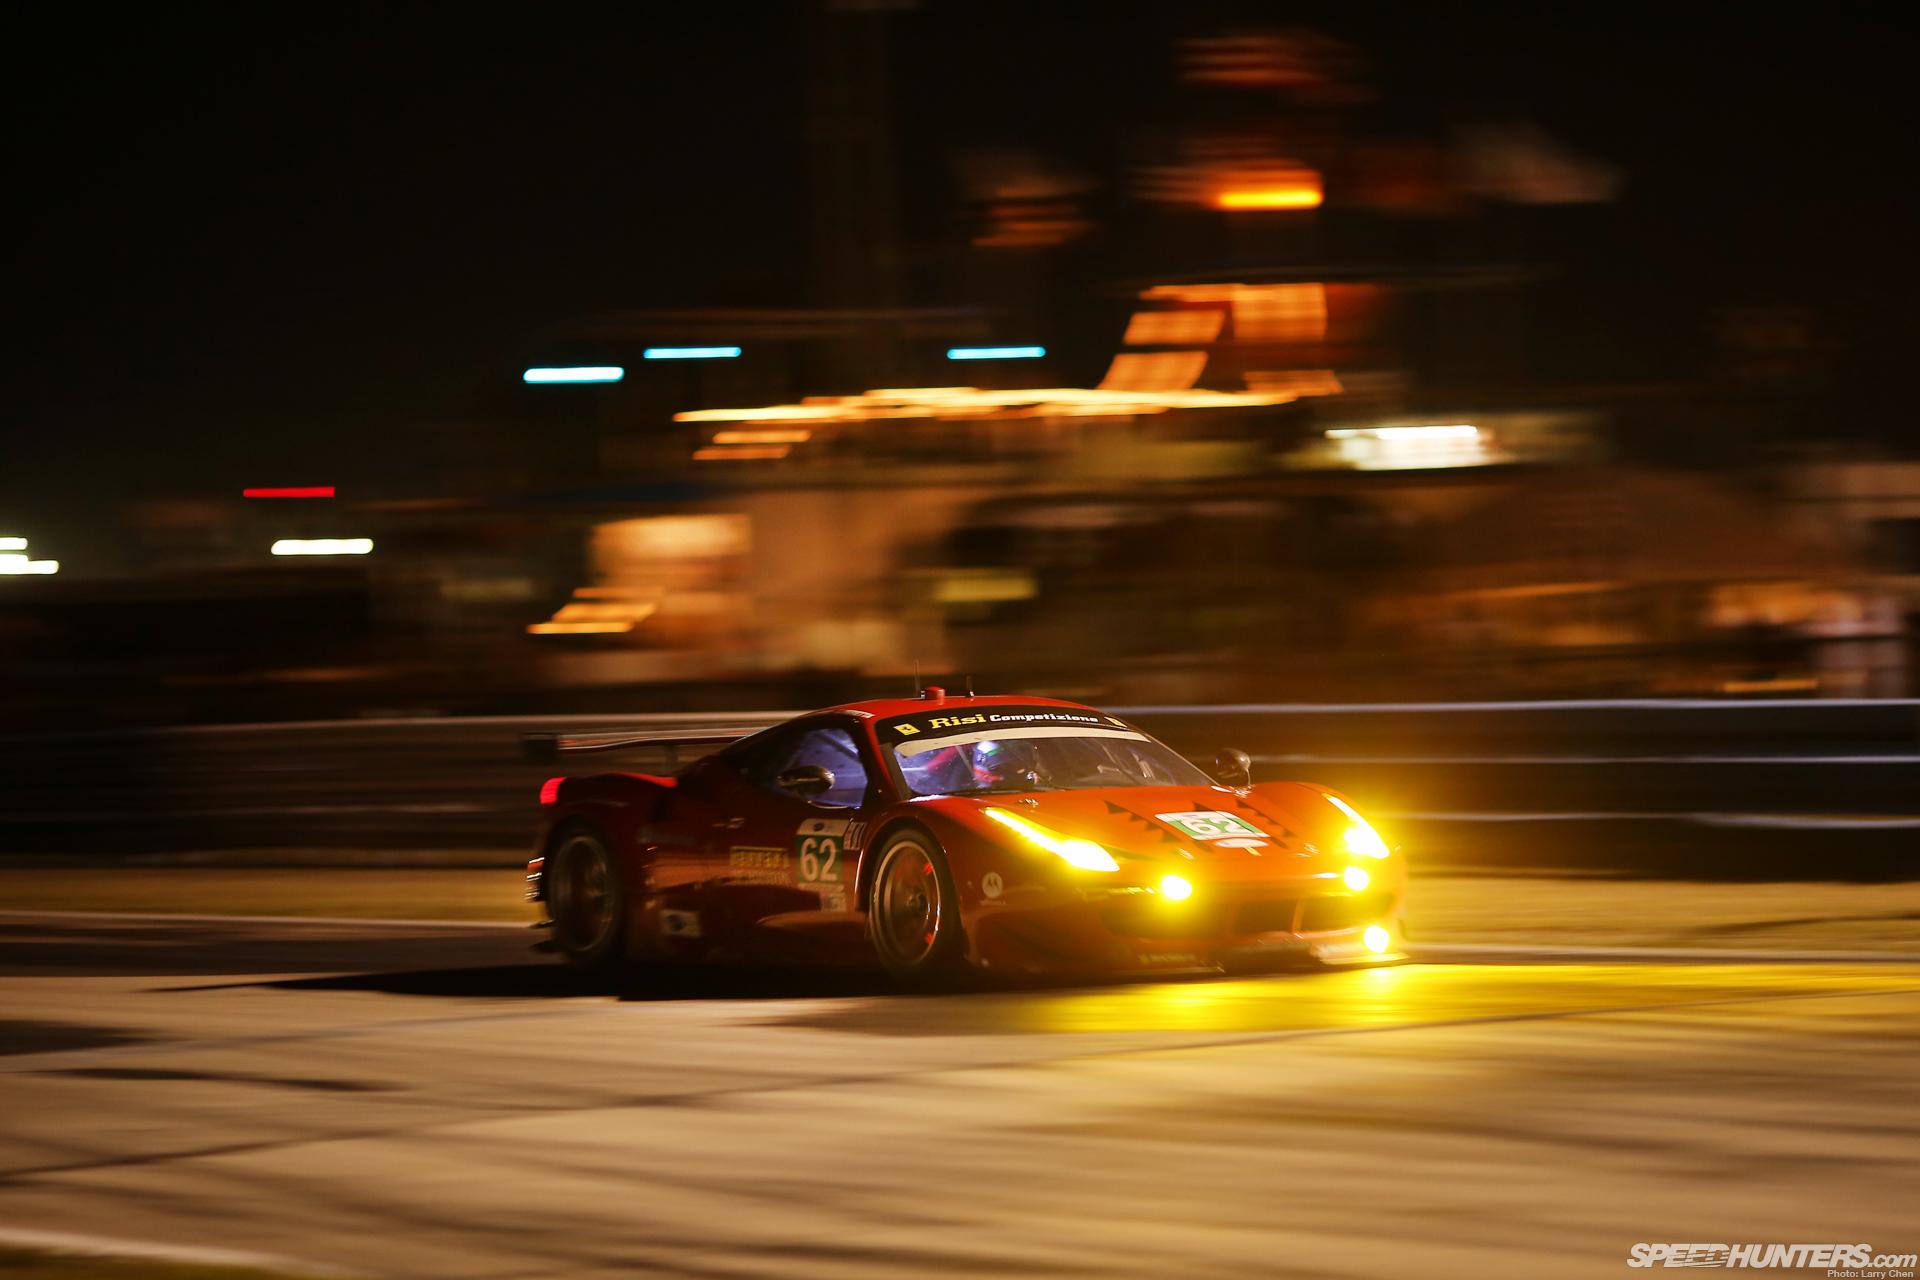 Best Wallpaper Night Ferrari - 3bc042048d0bc87c696f0e247b4c6396  Image-345542.jpg